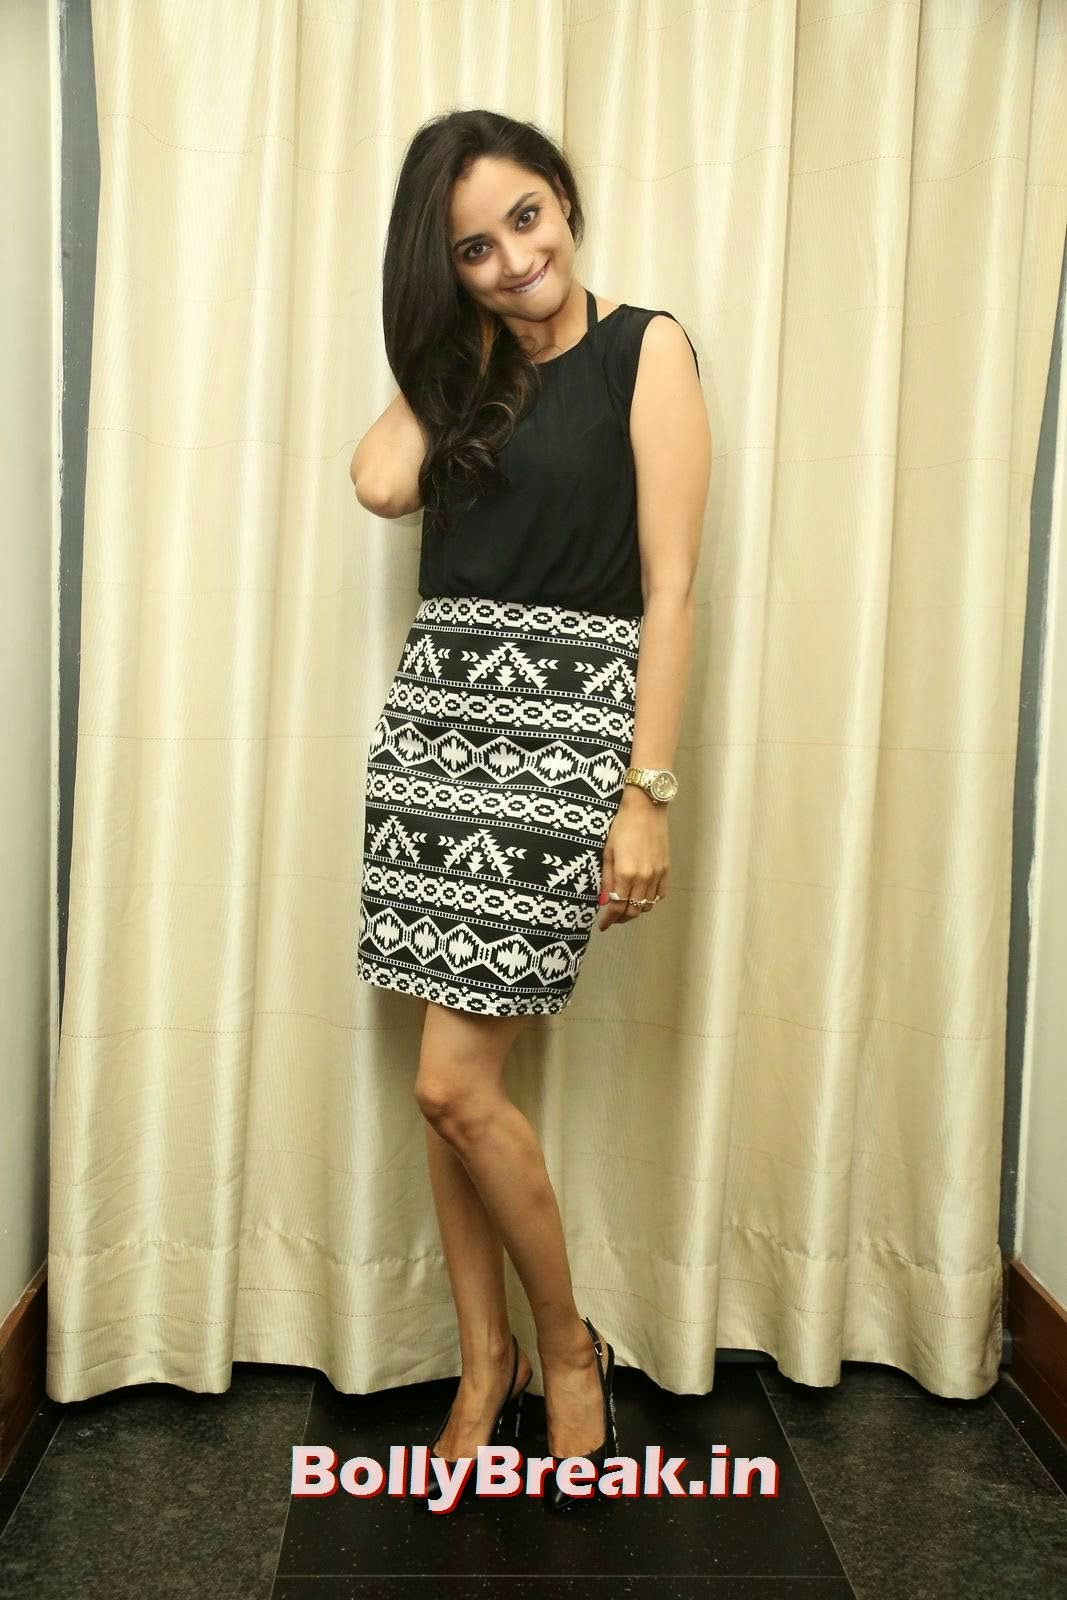 Madirakshi Pictures, Actress Madirakshi Hot Pics in Skirt & Black Top